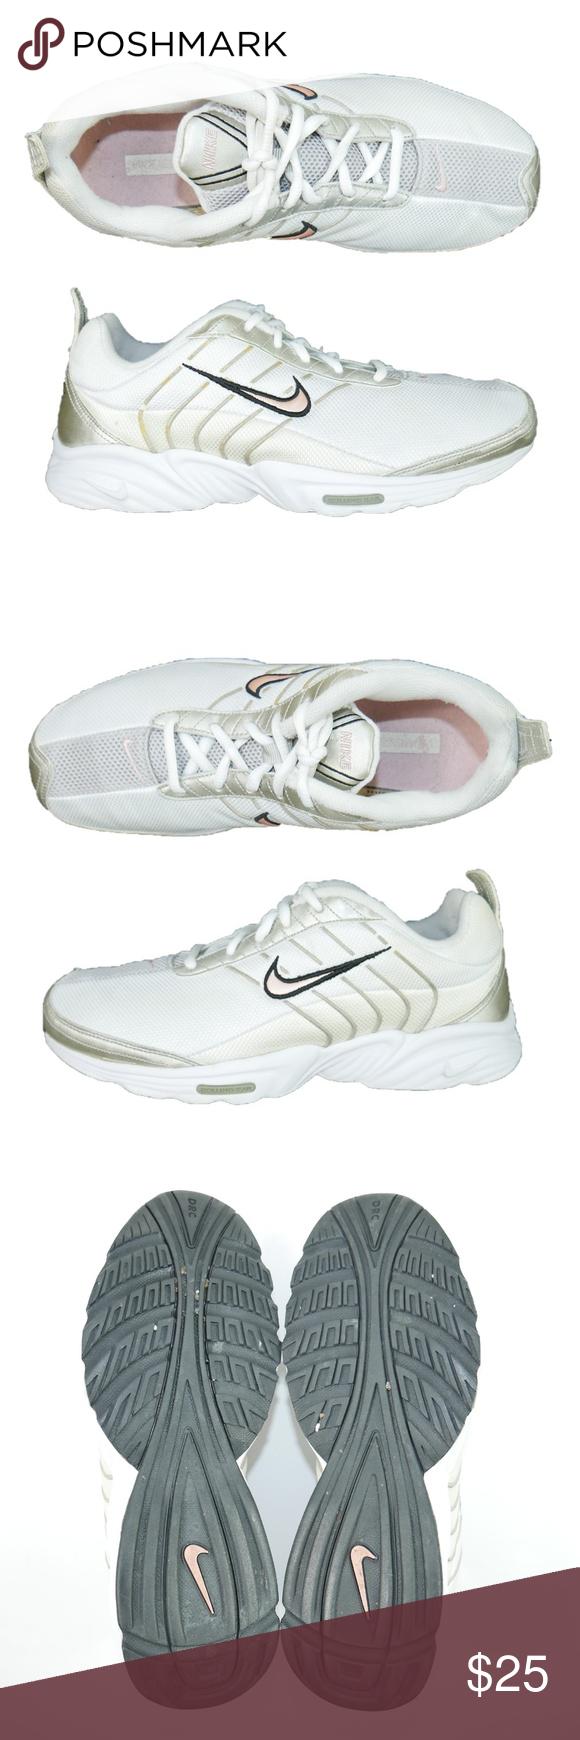 Nike Air Shoo In Comfort Walking Shoe Rolling Rail Walking Shoes Nike Nike Air